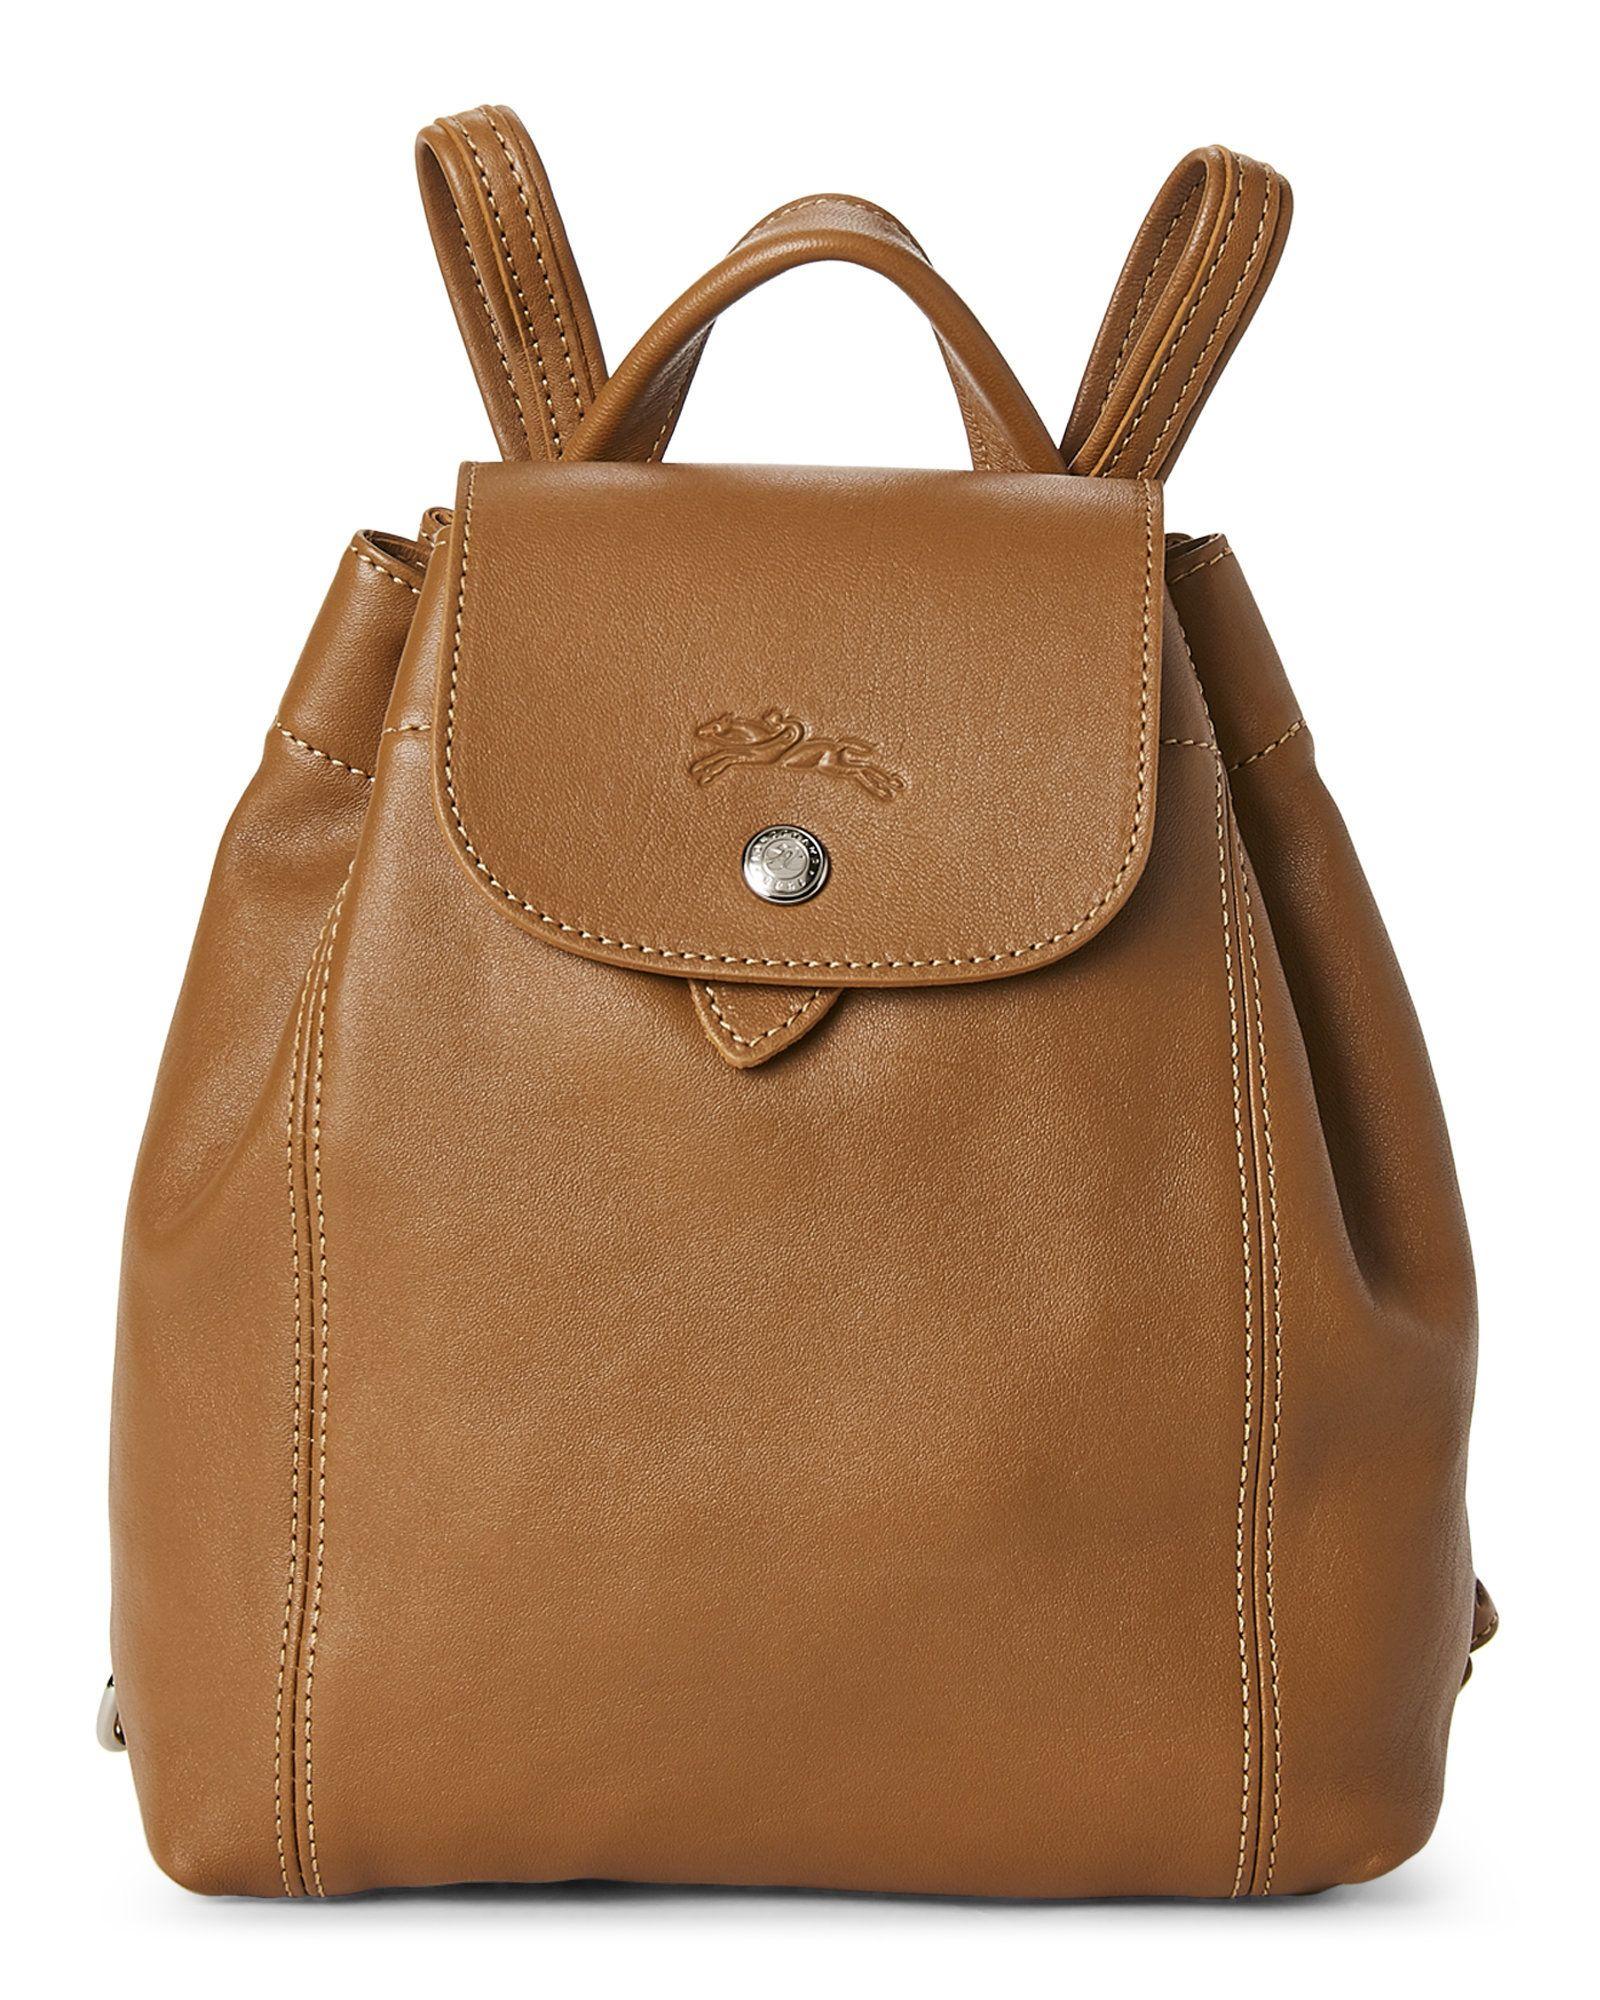 Longchamp Natural Le Pliage Cuir Backpack Century 21 Replica Handbags Designer Street